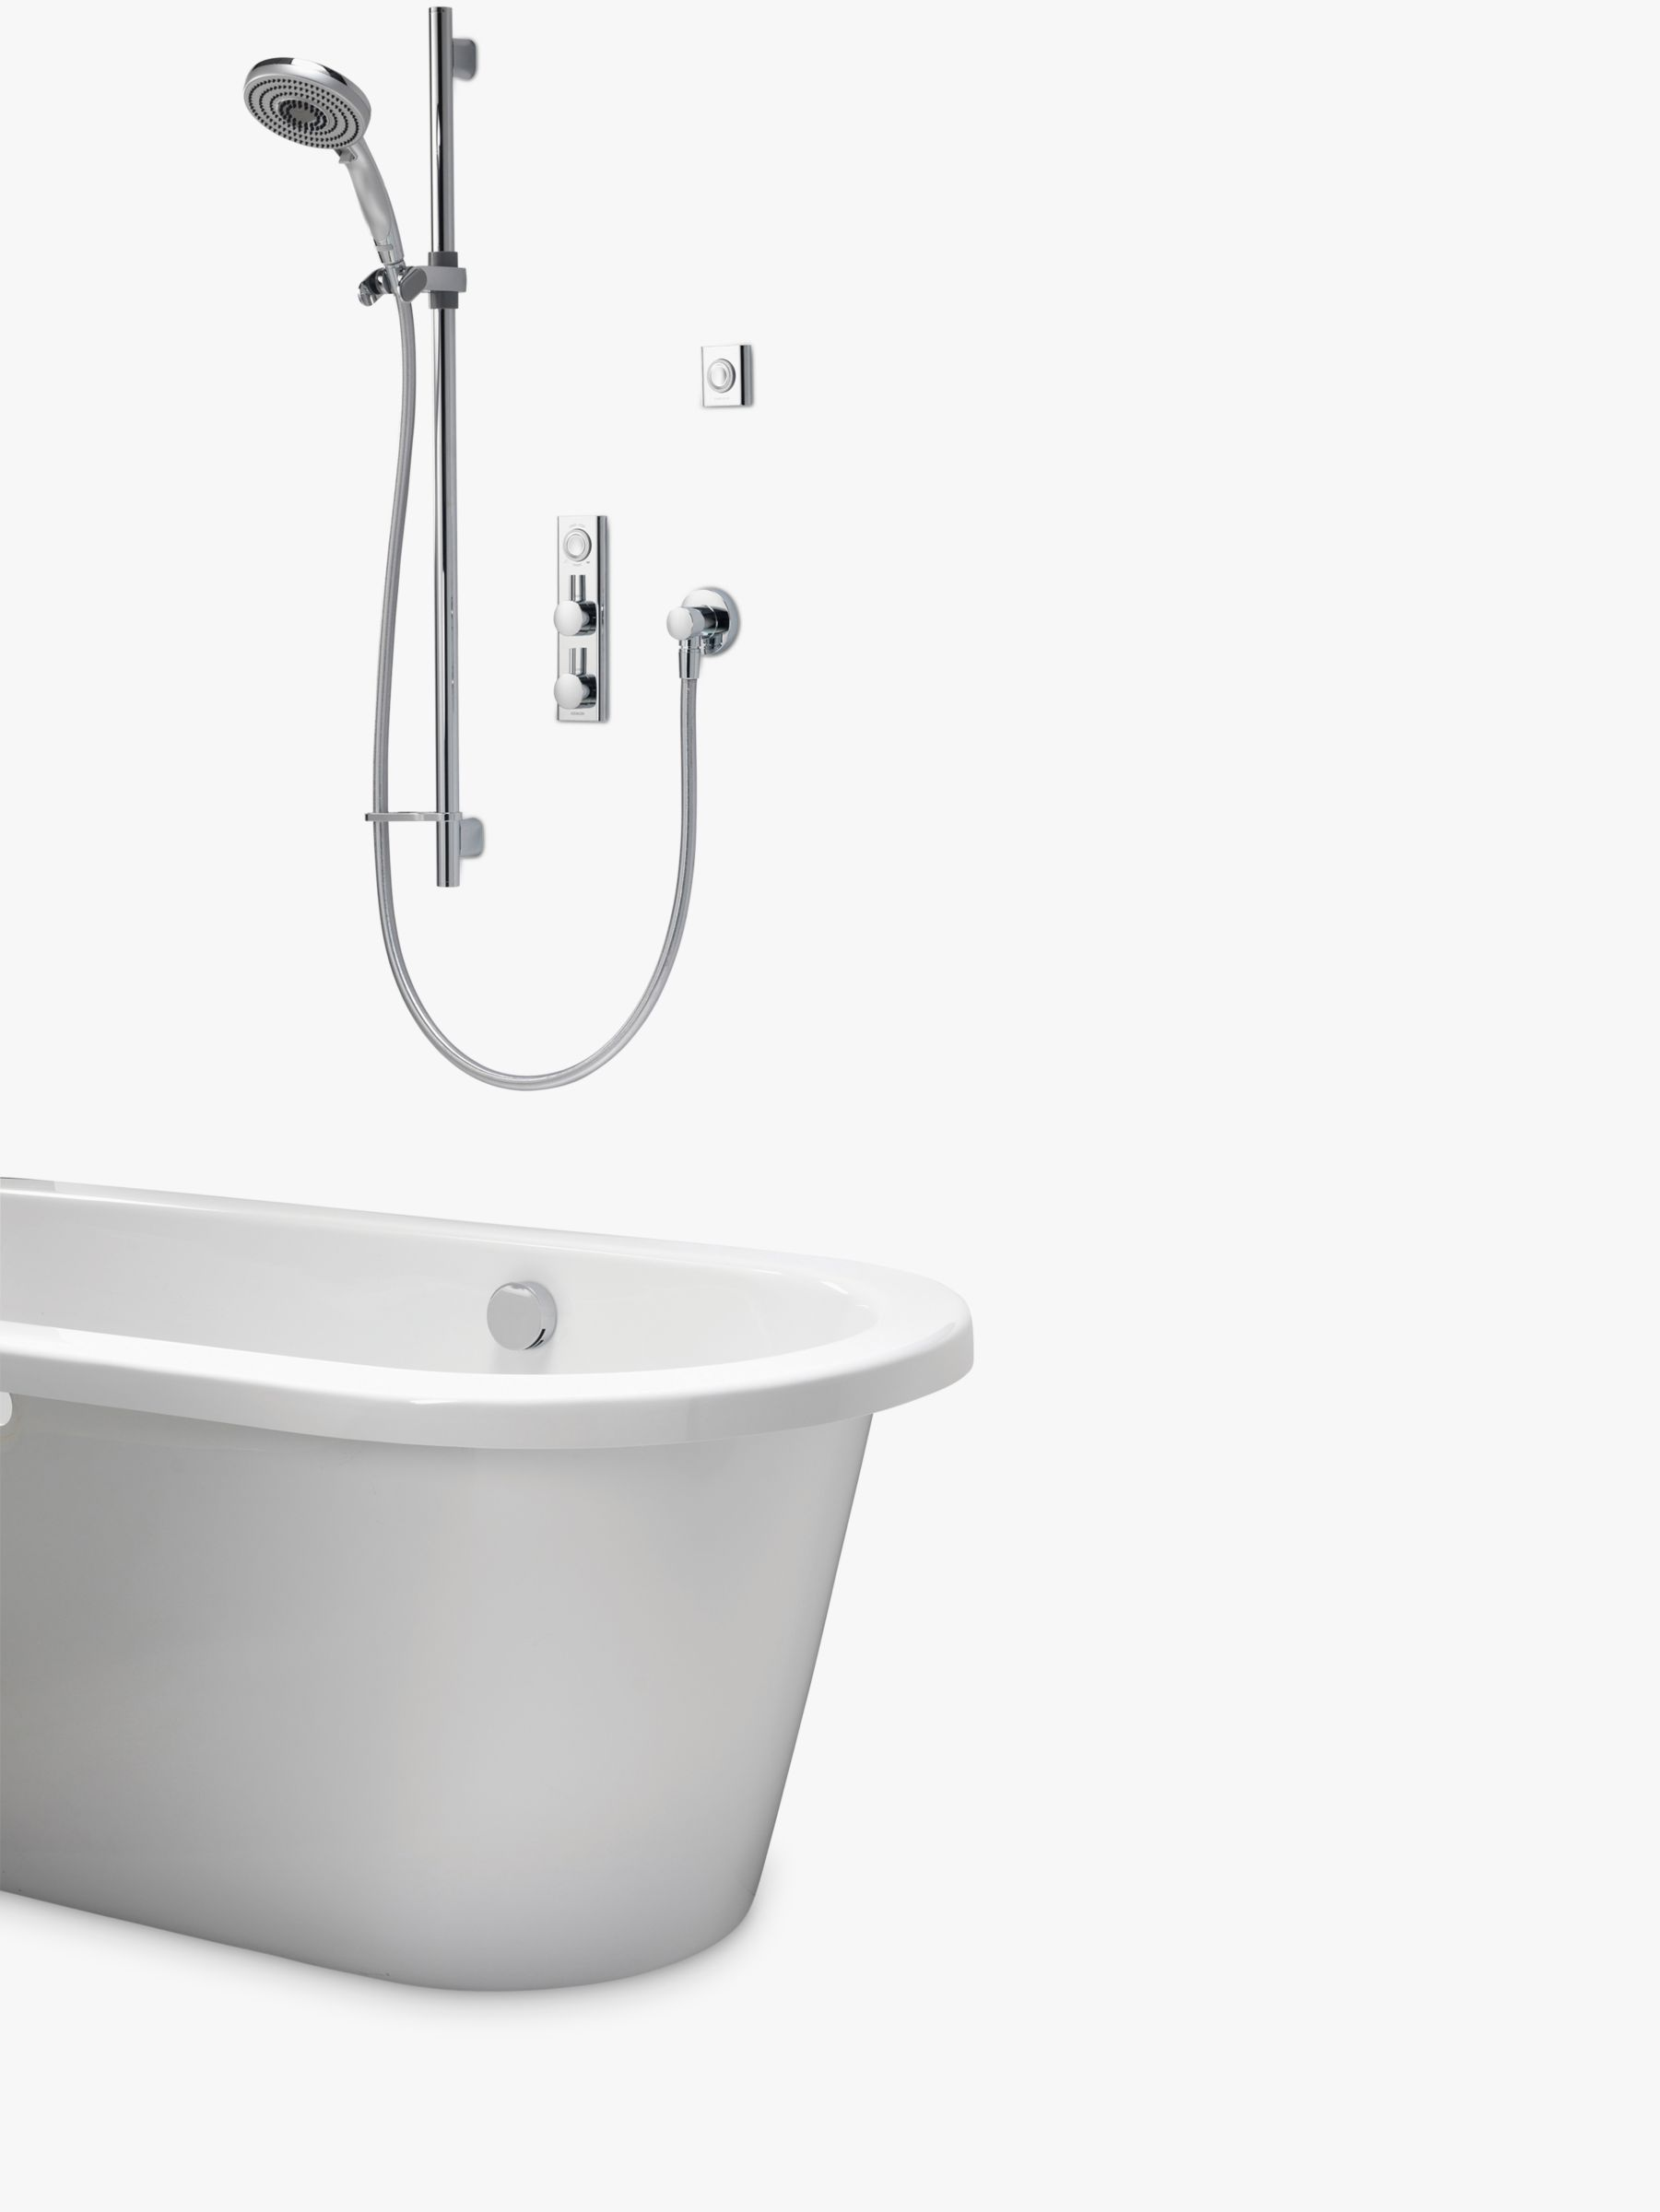 Aqualisa Aqualisa HiQu 5 Smart Shower with Handset, Silver